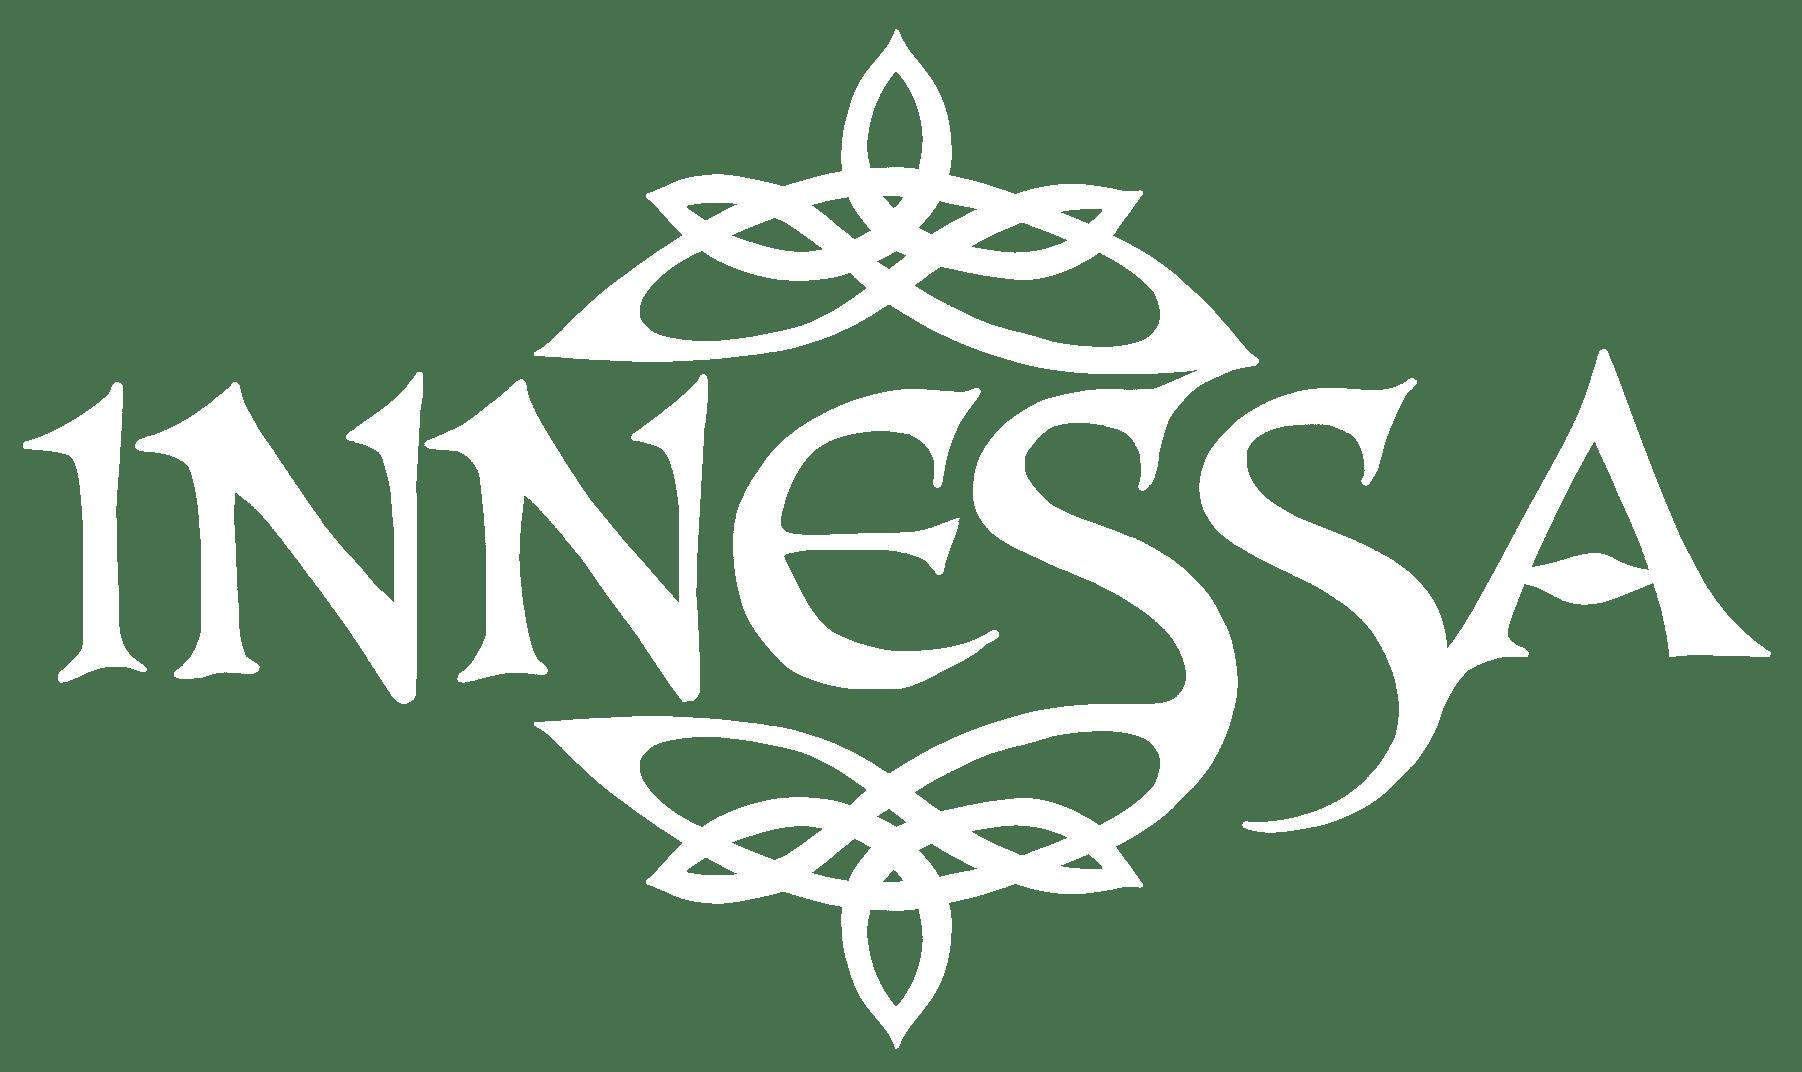 inessa-logo3white